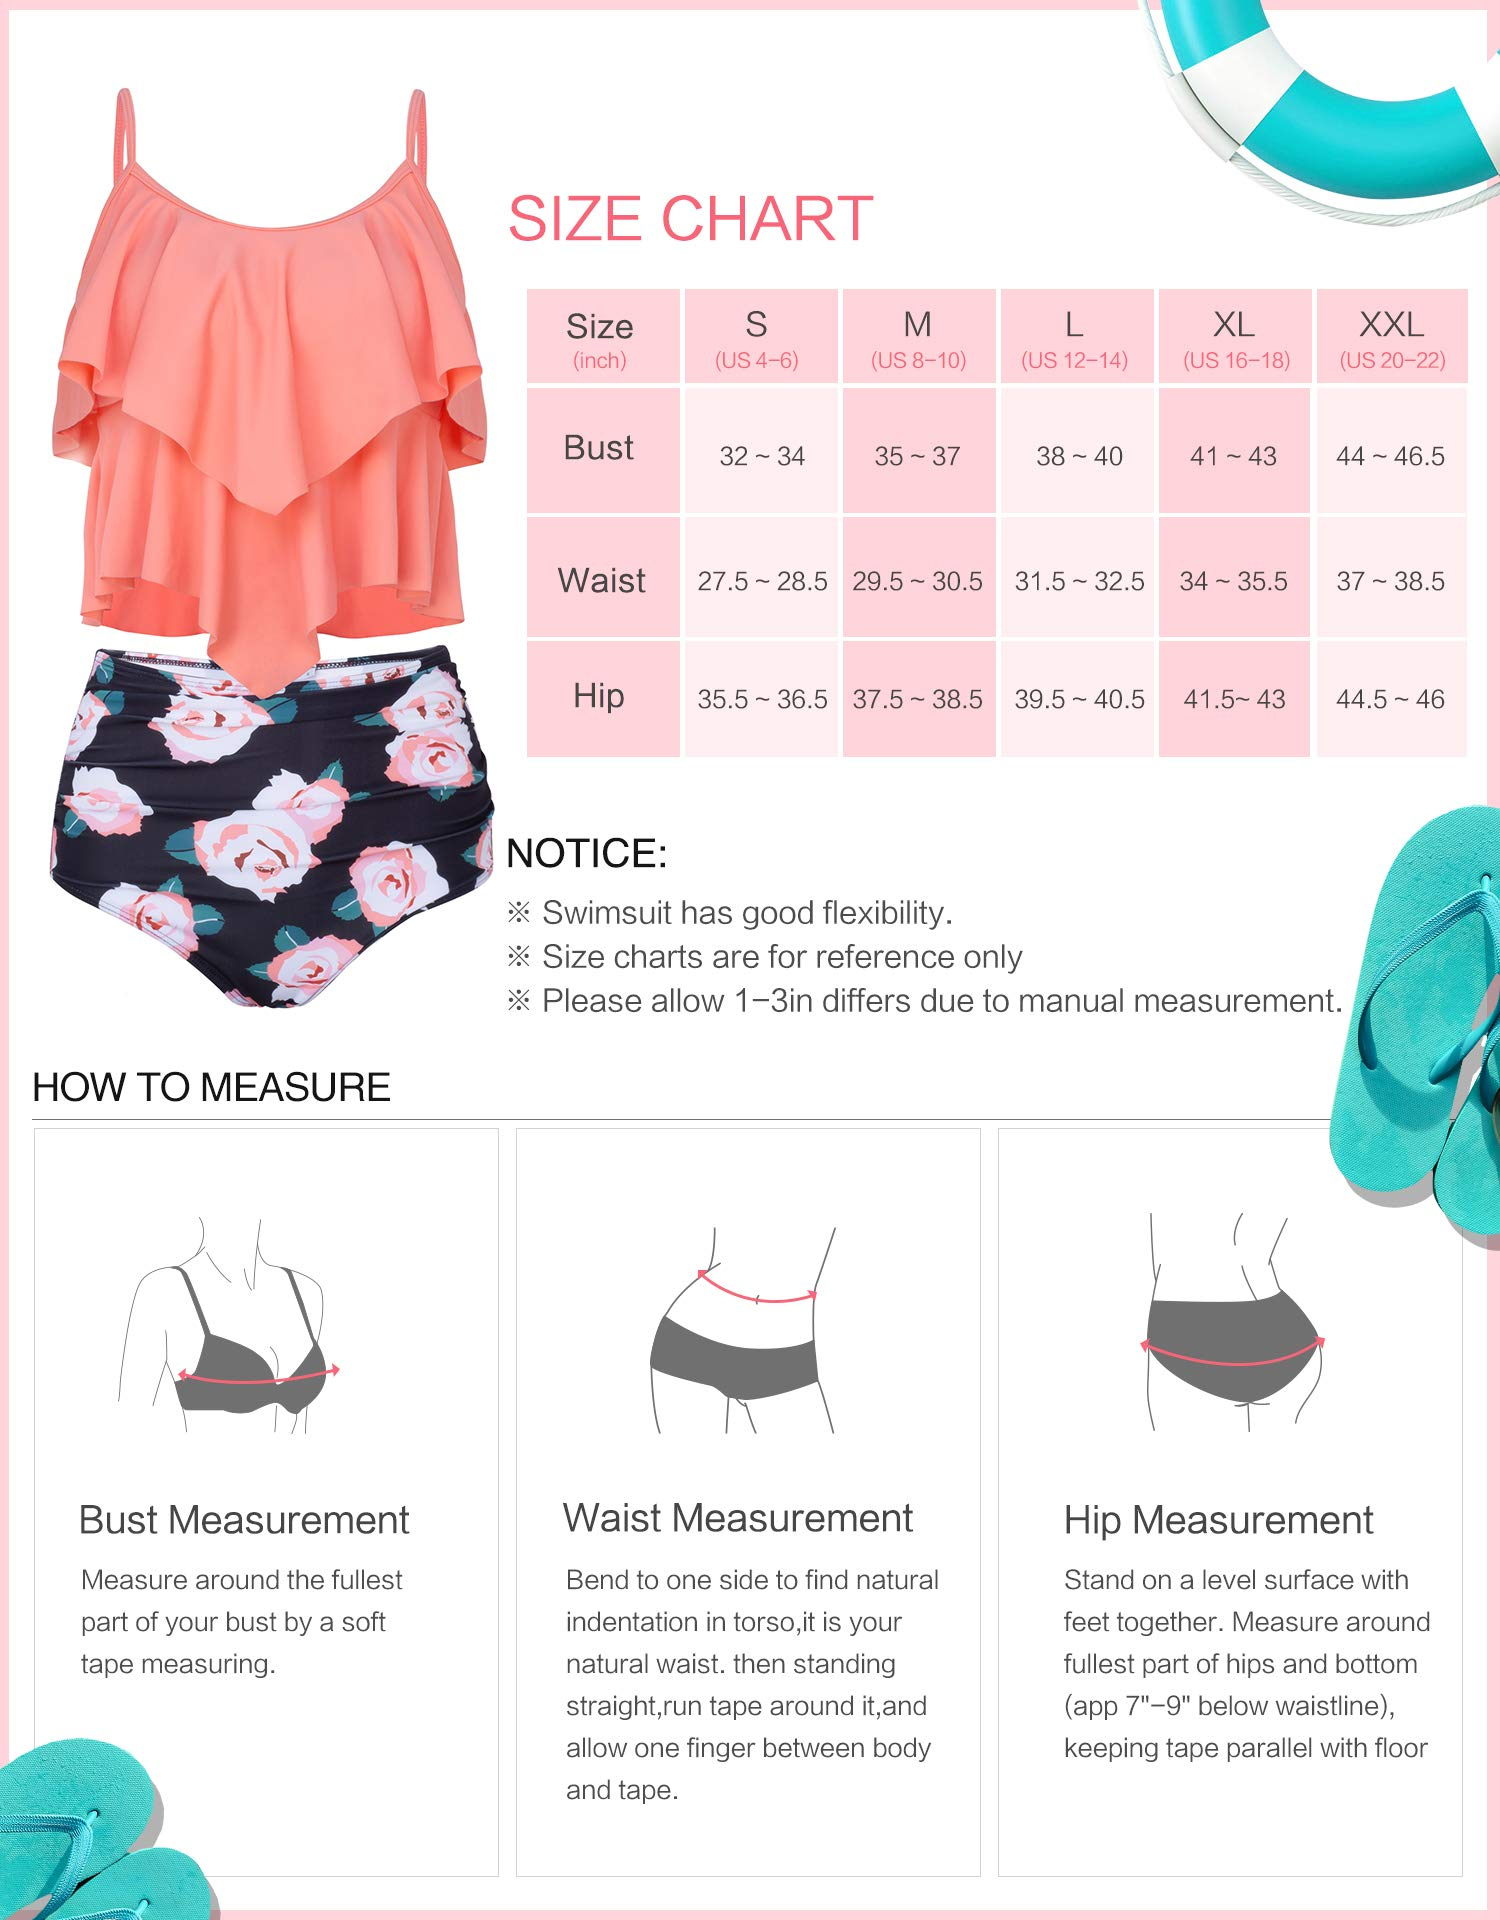 Verano Playa Women Two Piece Swimsuit Ruffle Layered Tankini Top with High Waist Bottom Bathing Suit Orange Pink